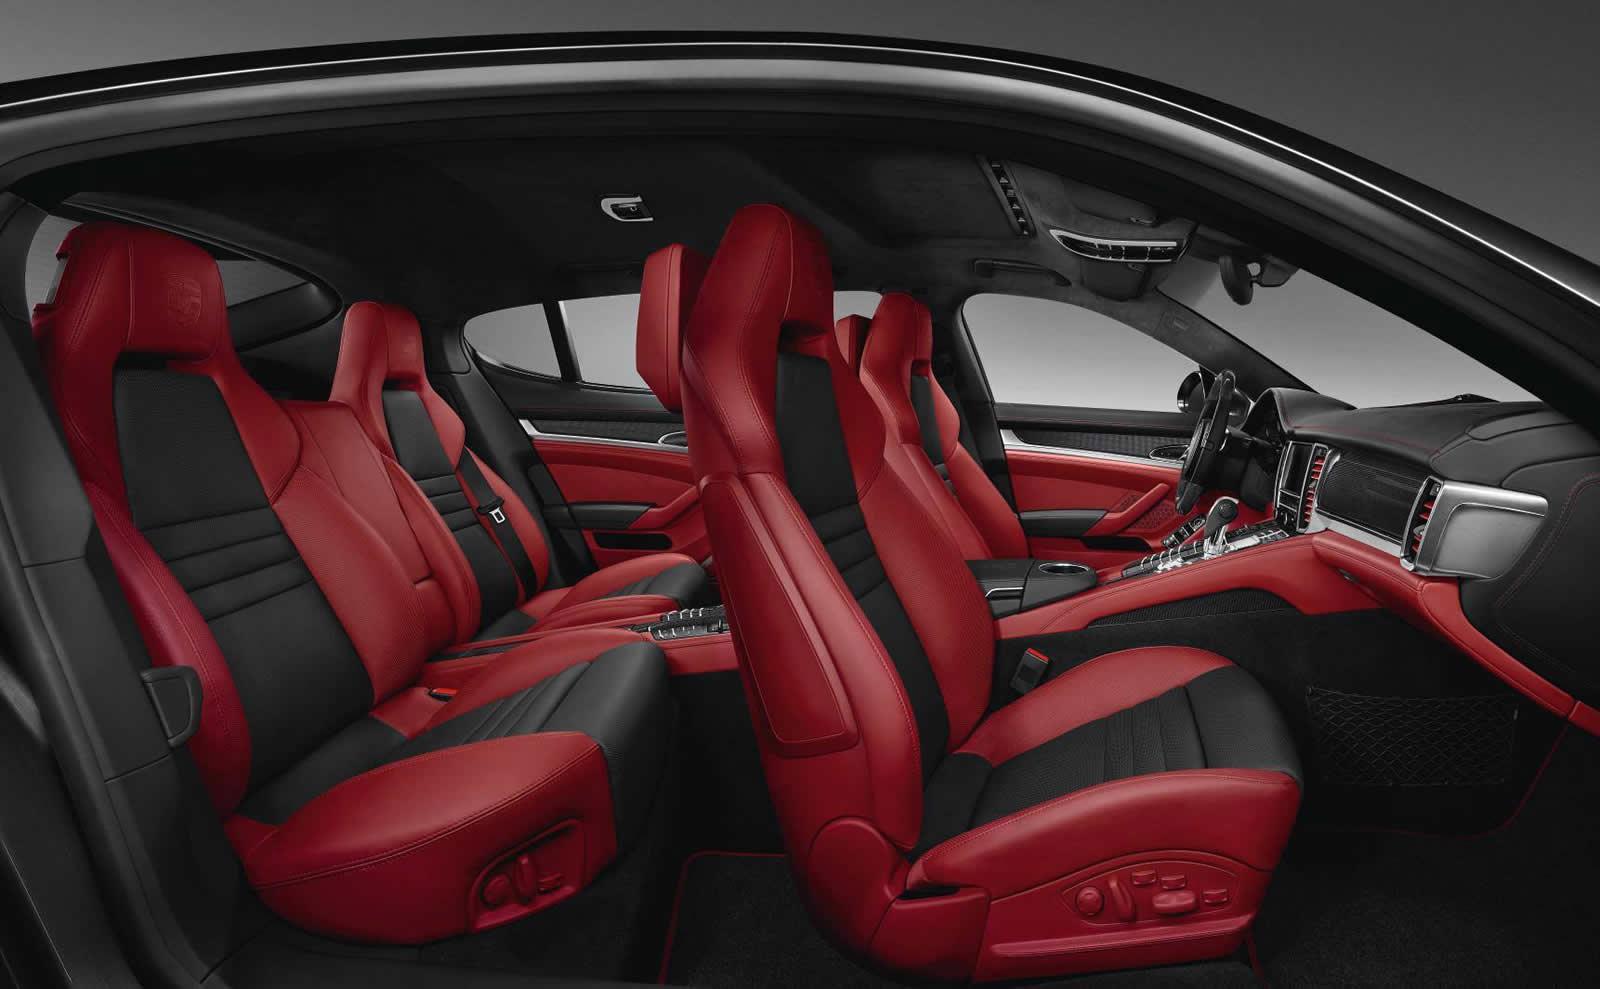 porsche panamera turbo s exclusive 3 of 3 - Porsche Panamera 2014 Black